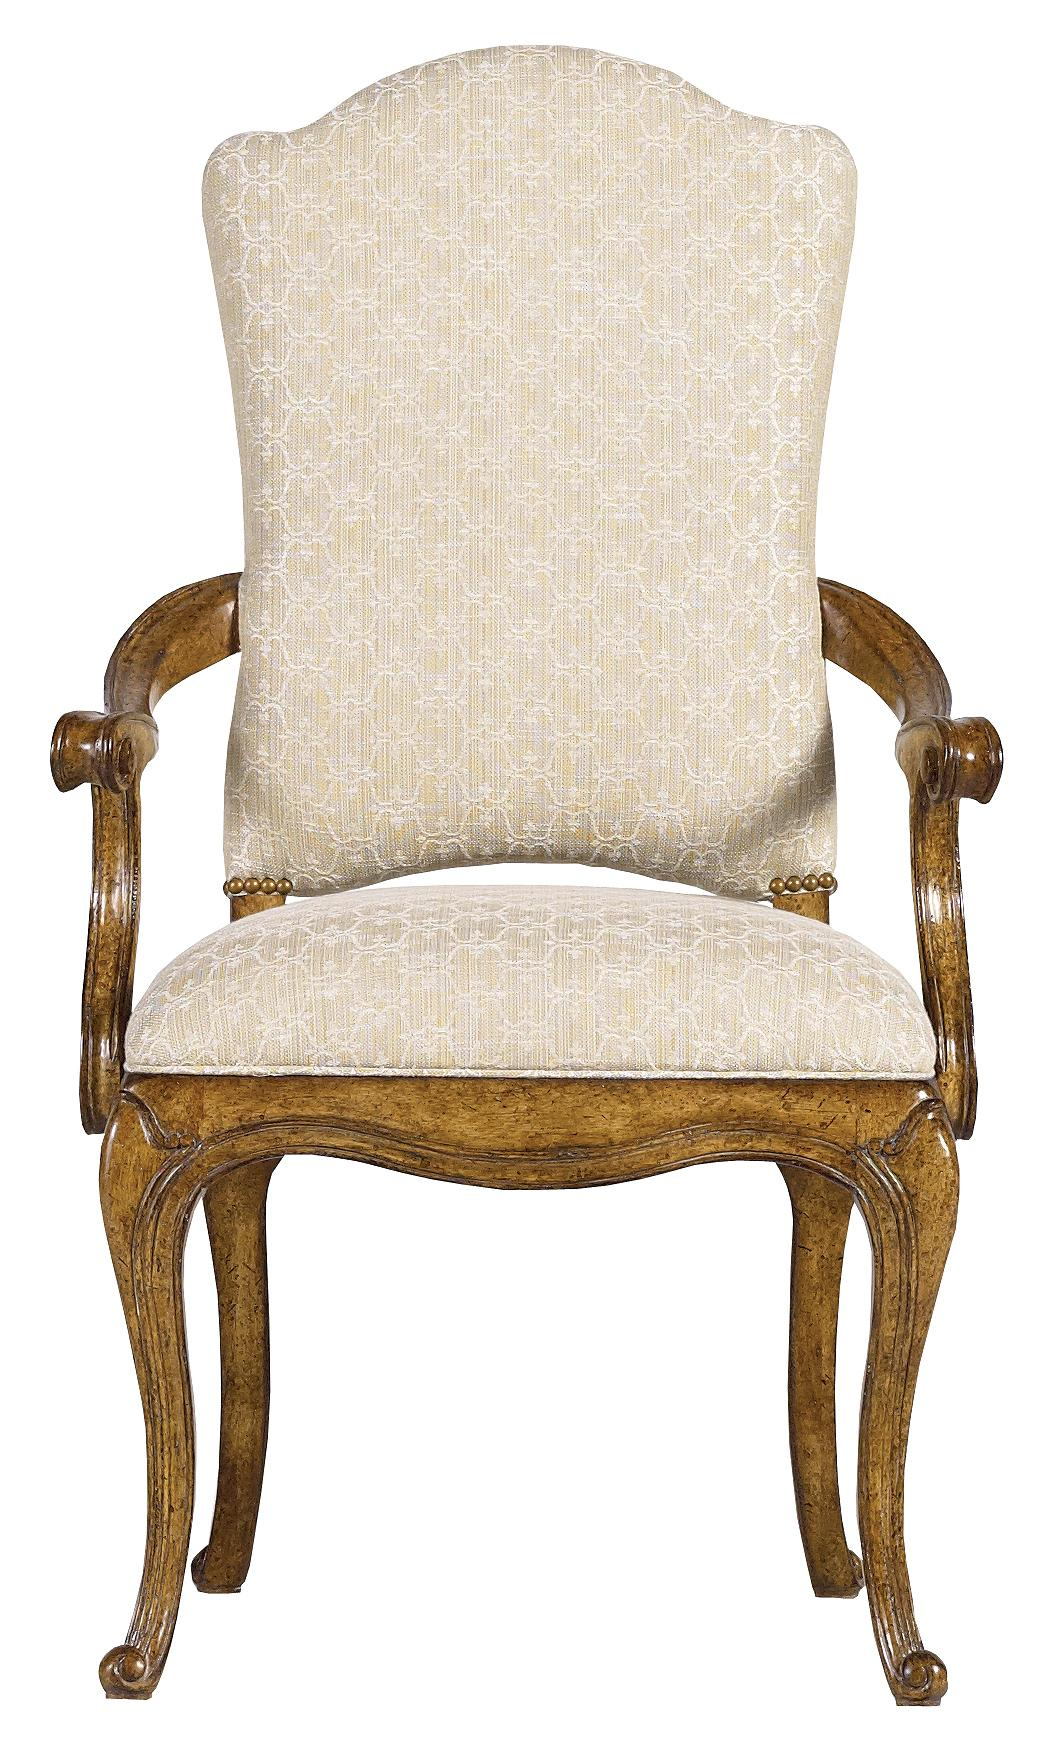 Stanley Furniture Arrondissement Volute Arm Chair - Item Number: 222-61-75